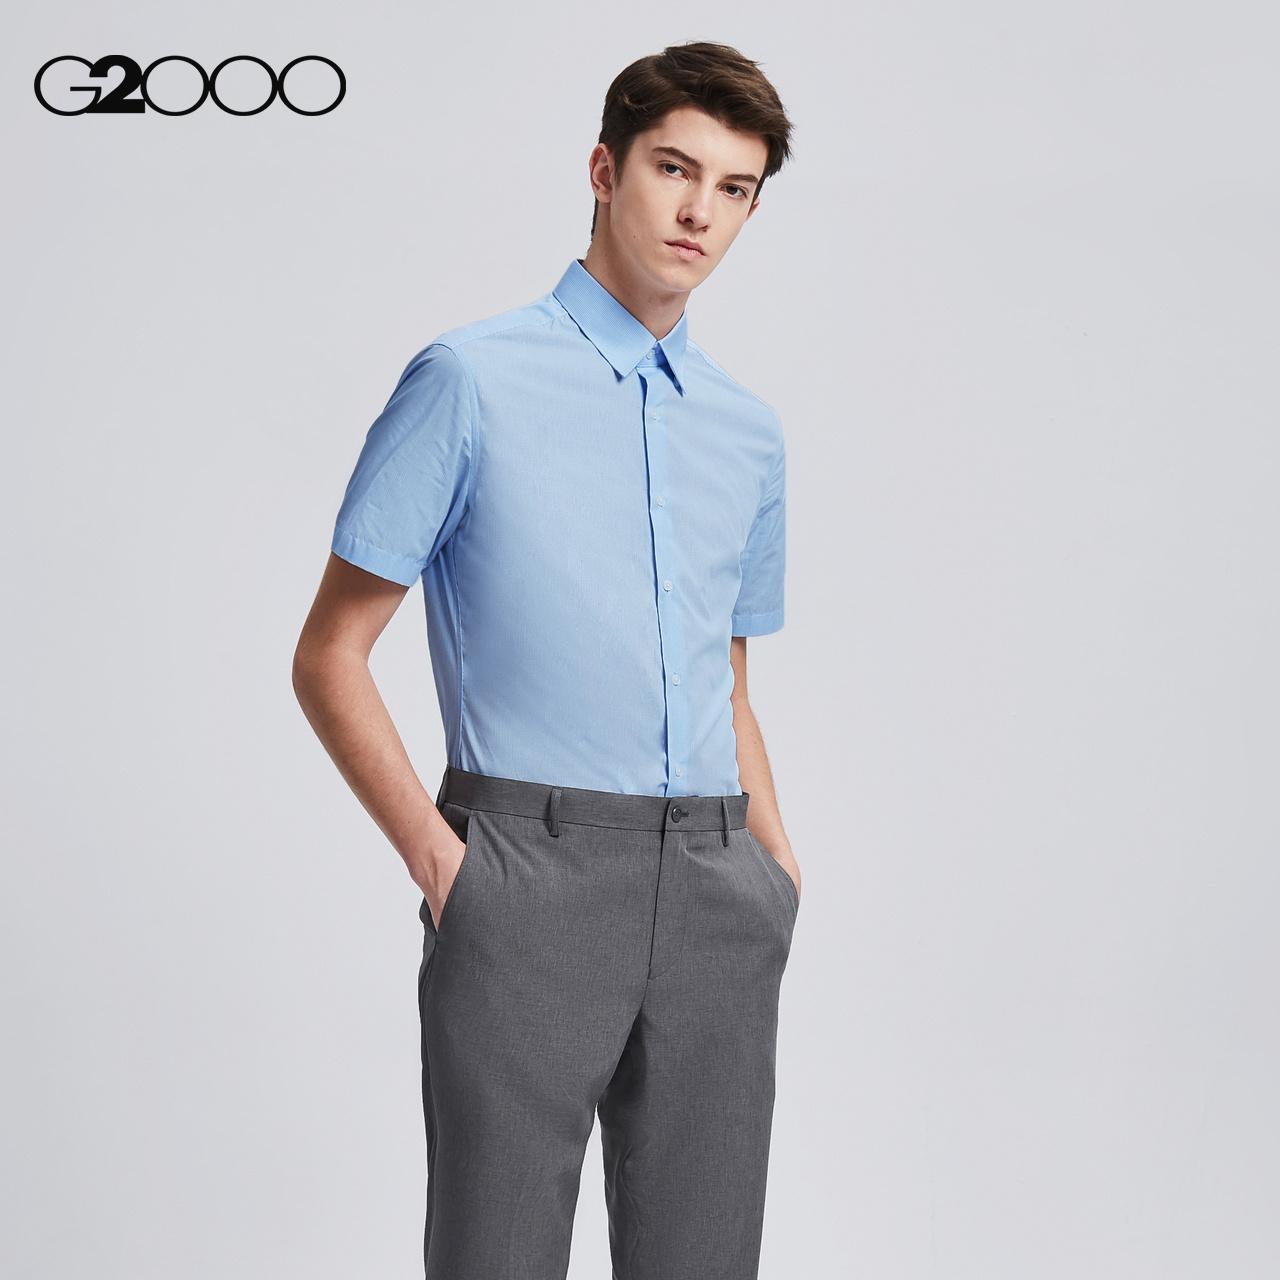 G2000男装青年装棉质柔软修身防皱商务职业休闲衬衣短袖